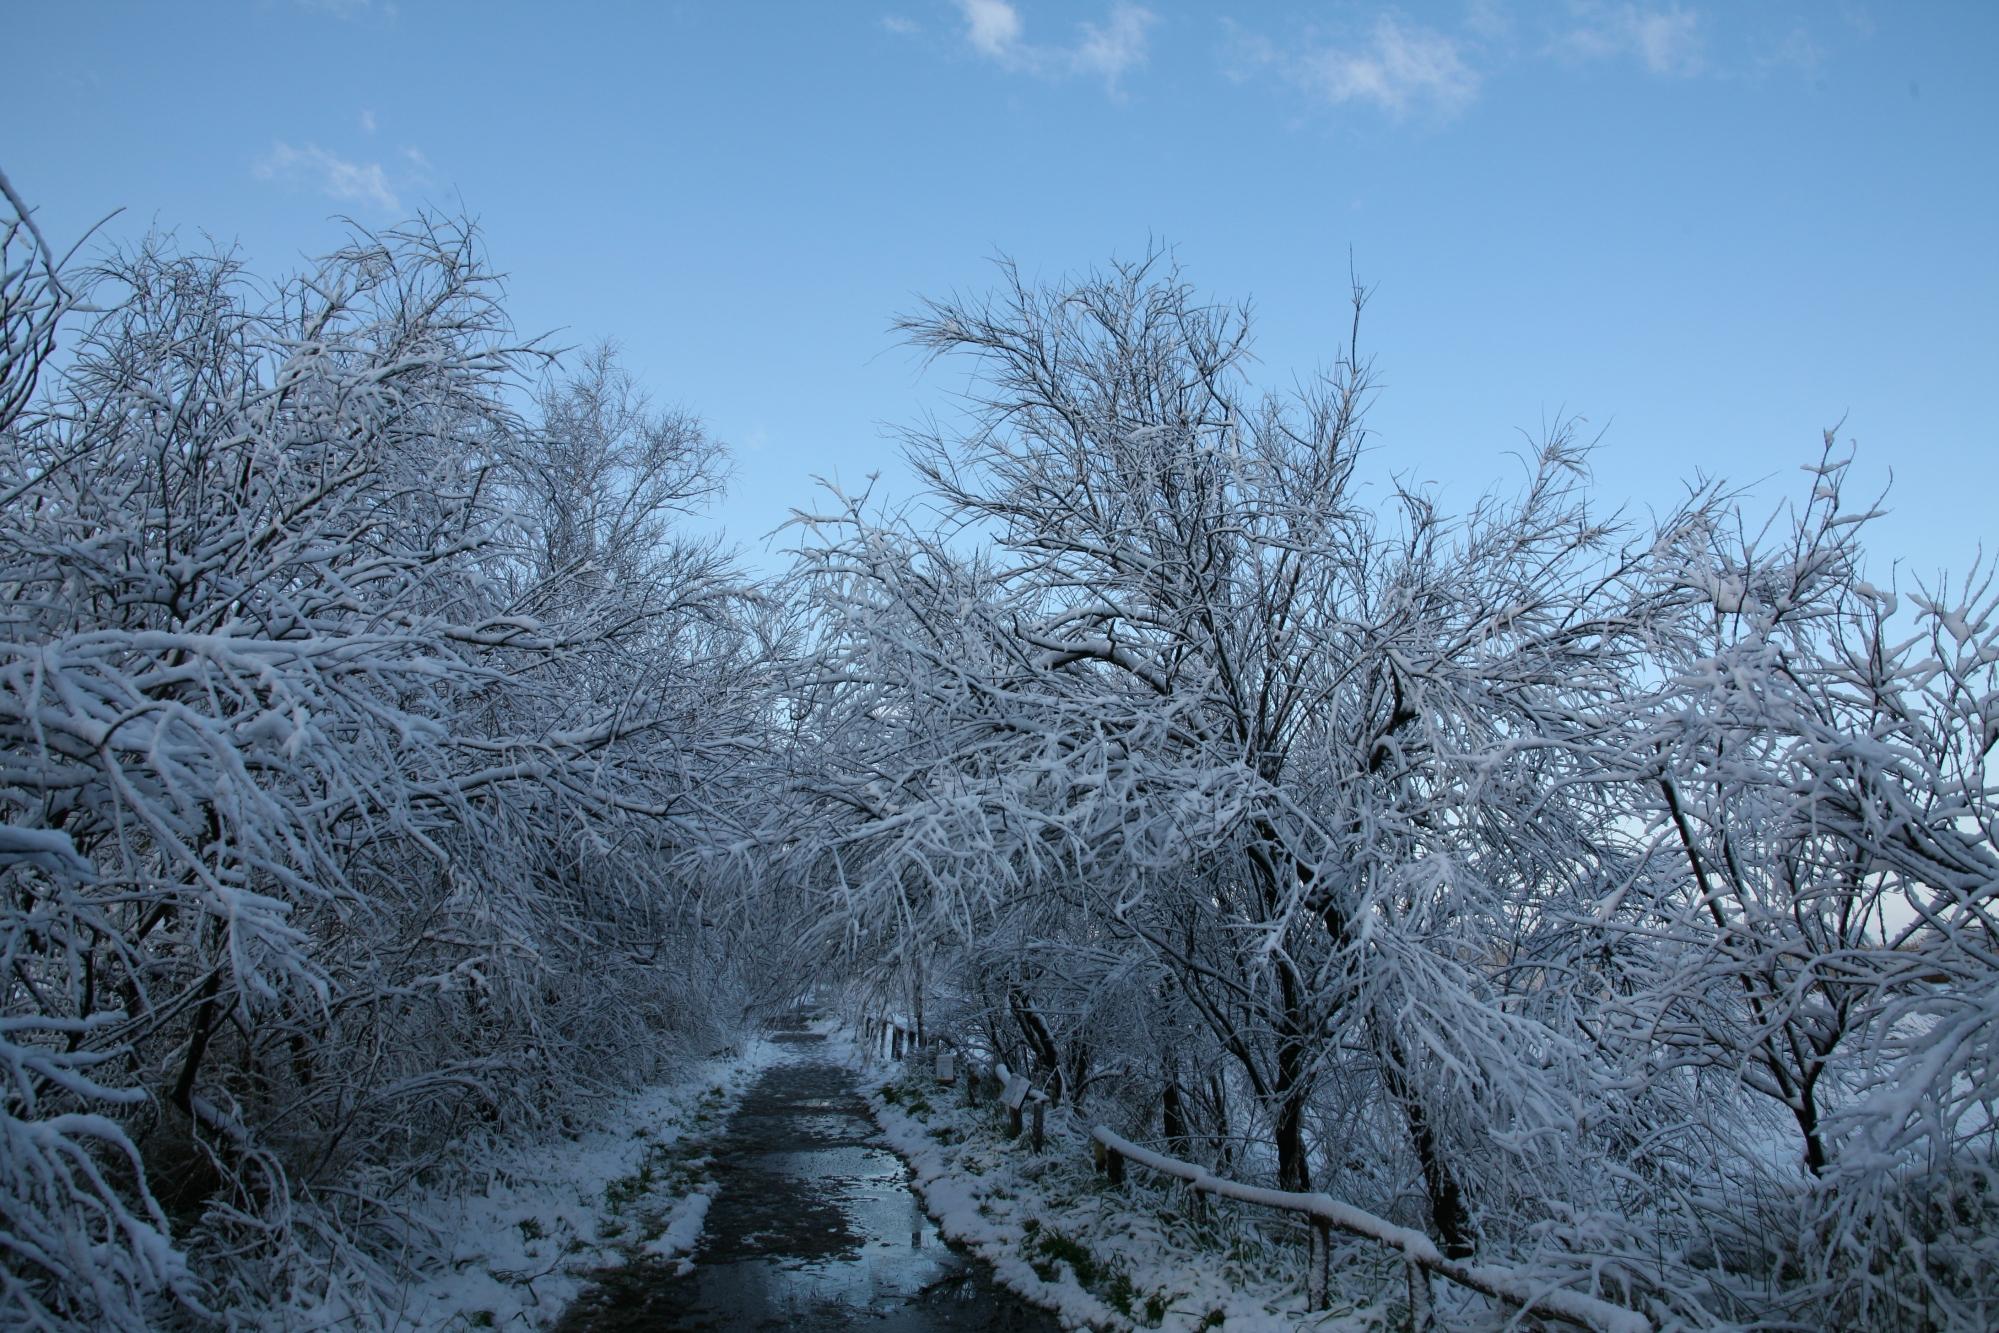 https://etiliyle.files.wordpress.com/2018/02/etiliyle-wordpress-com-luca-molinari-photo-etiliyle-blog-fotografia-pictures-poem-poems-poetry-poesy-pics-art-images-screenshot-share-e2809csnow-cold-winter-white-canon-eos-5.jpg?w=2000